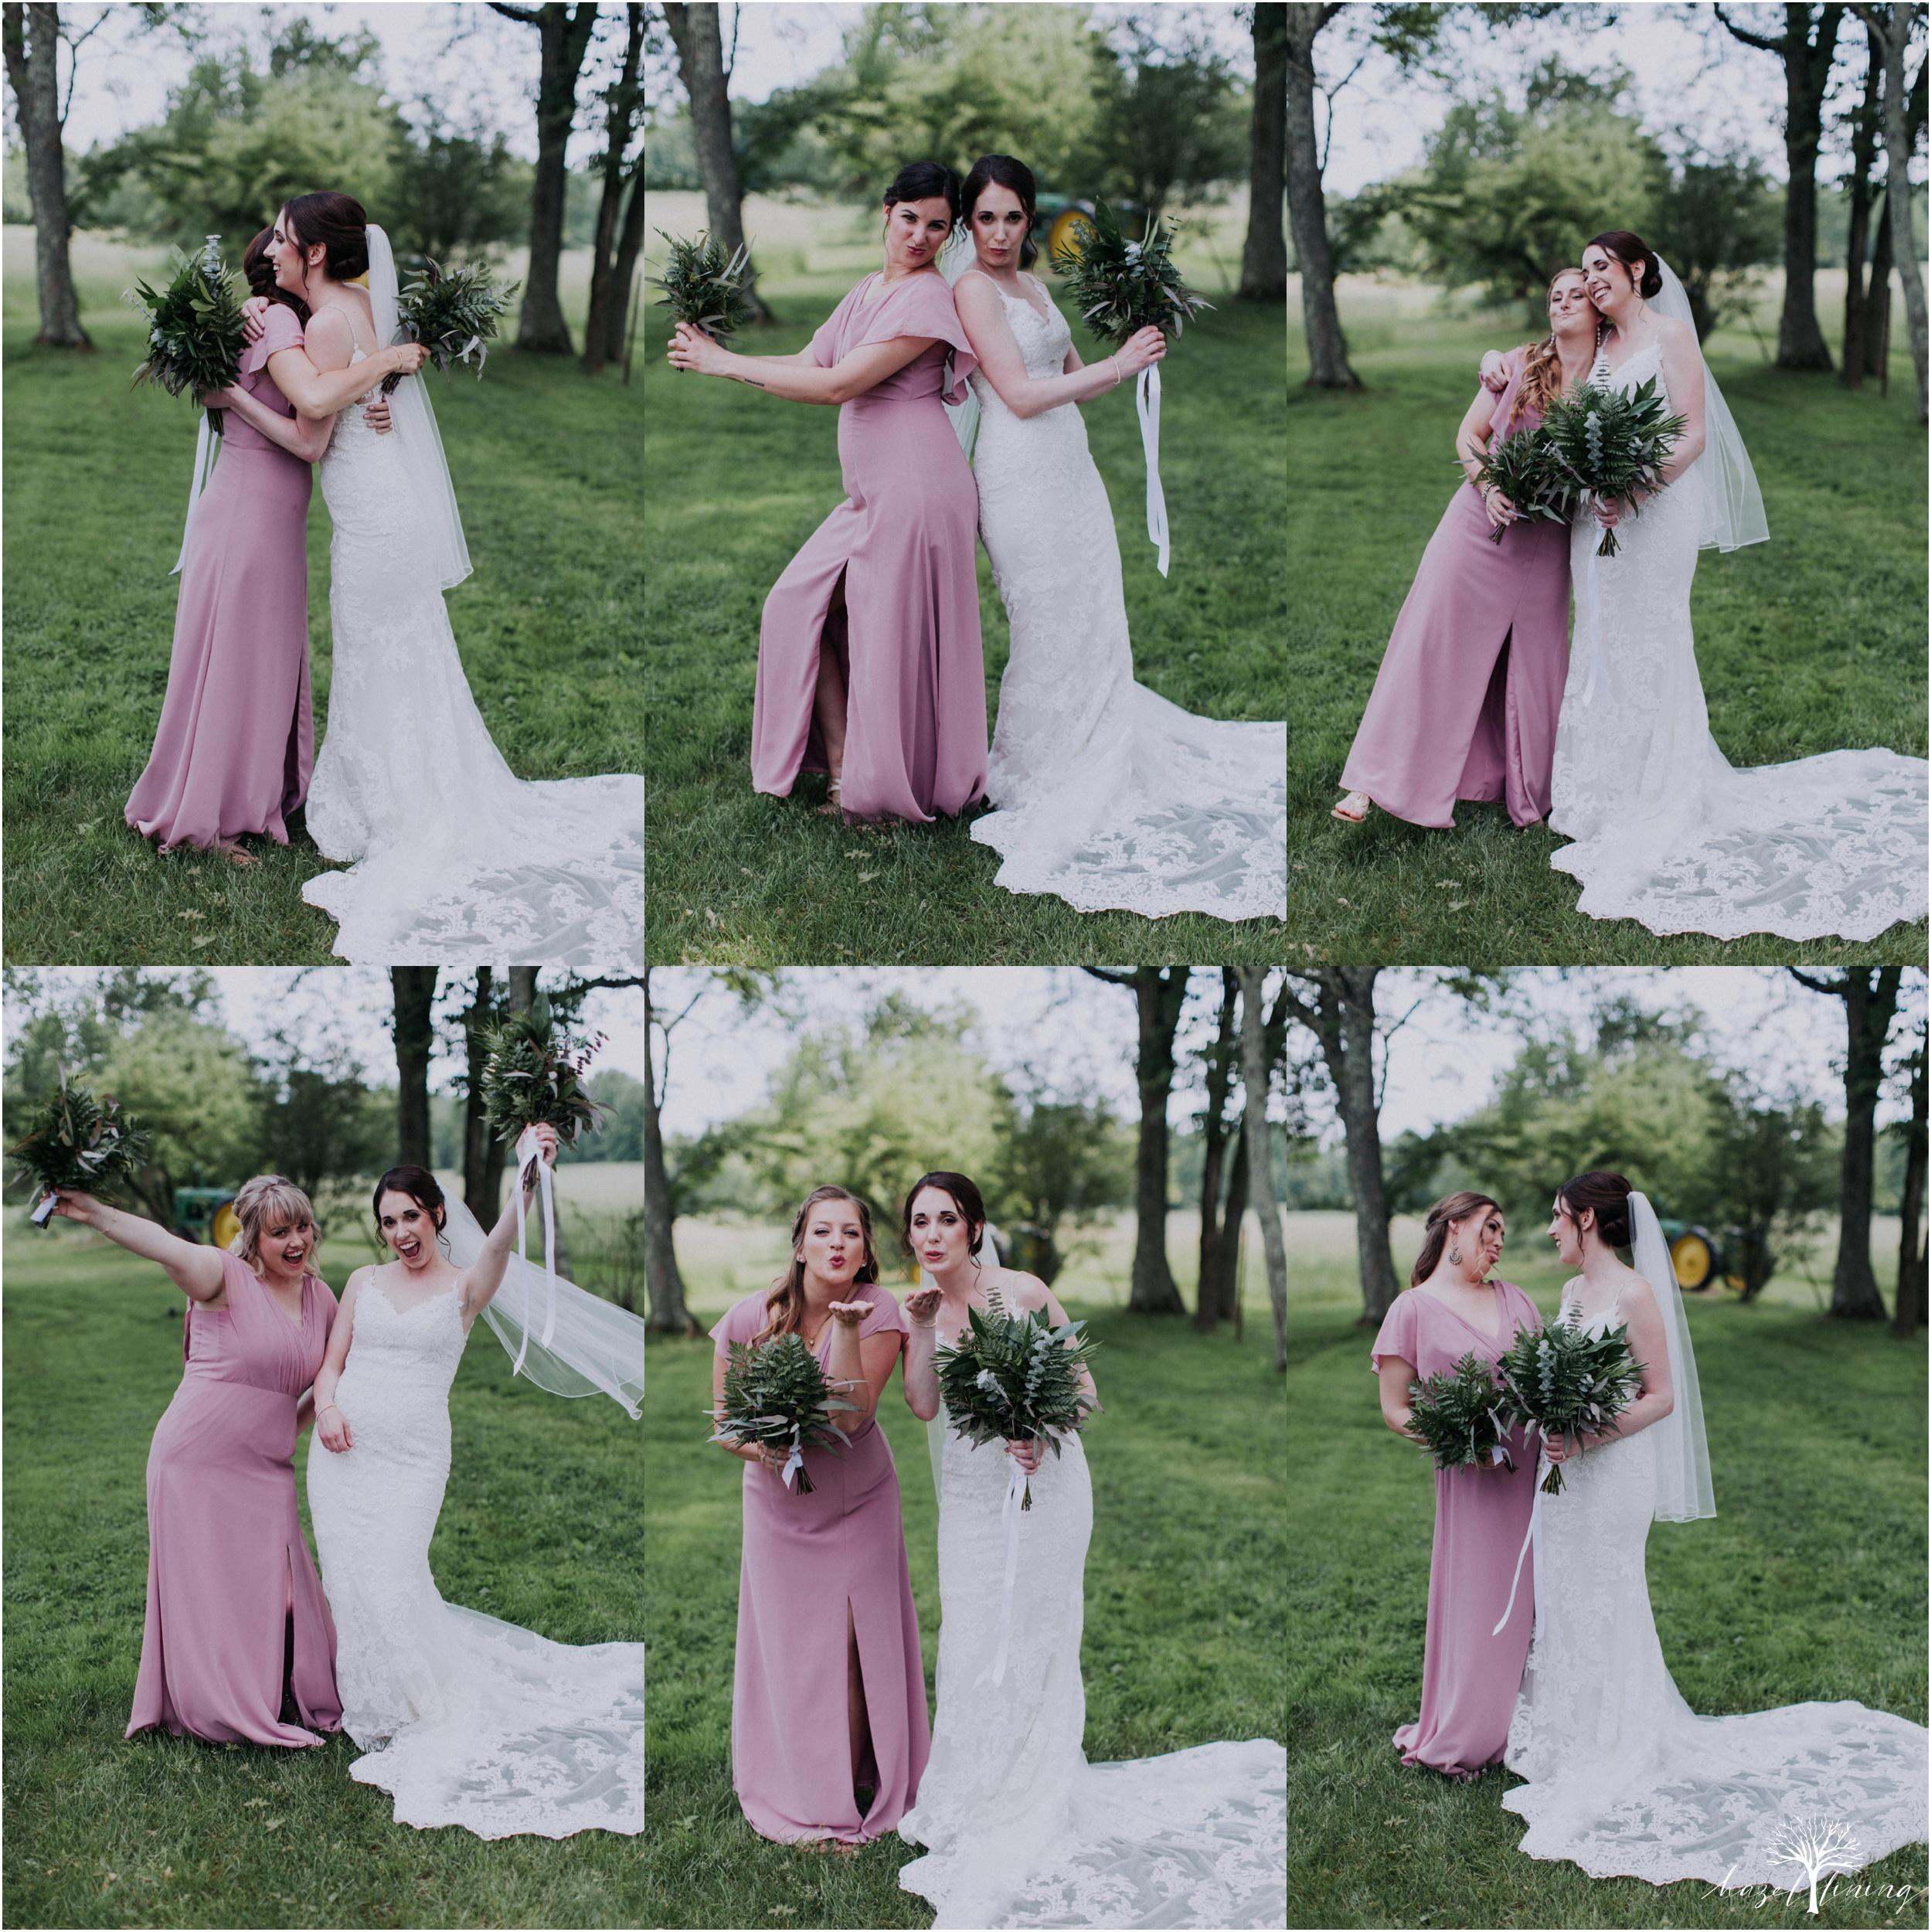 hazel-lining-travel-wedding-elopement-photography-lisa-landon-shoemaker-the-farm-bakery-and-events-bucks-county-quakertown-pennsylvania-summer-country-outdoor-farm-wedding_0028.jpg